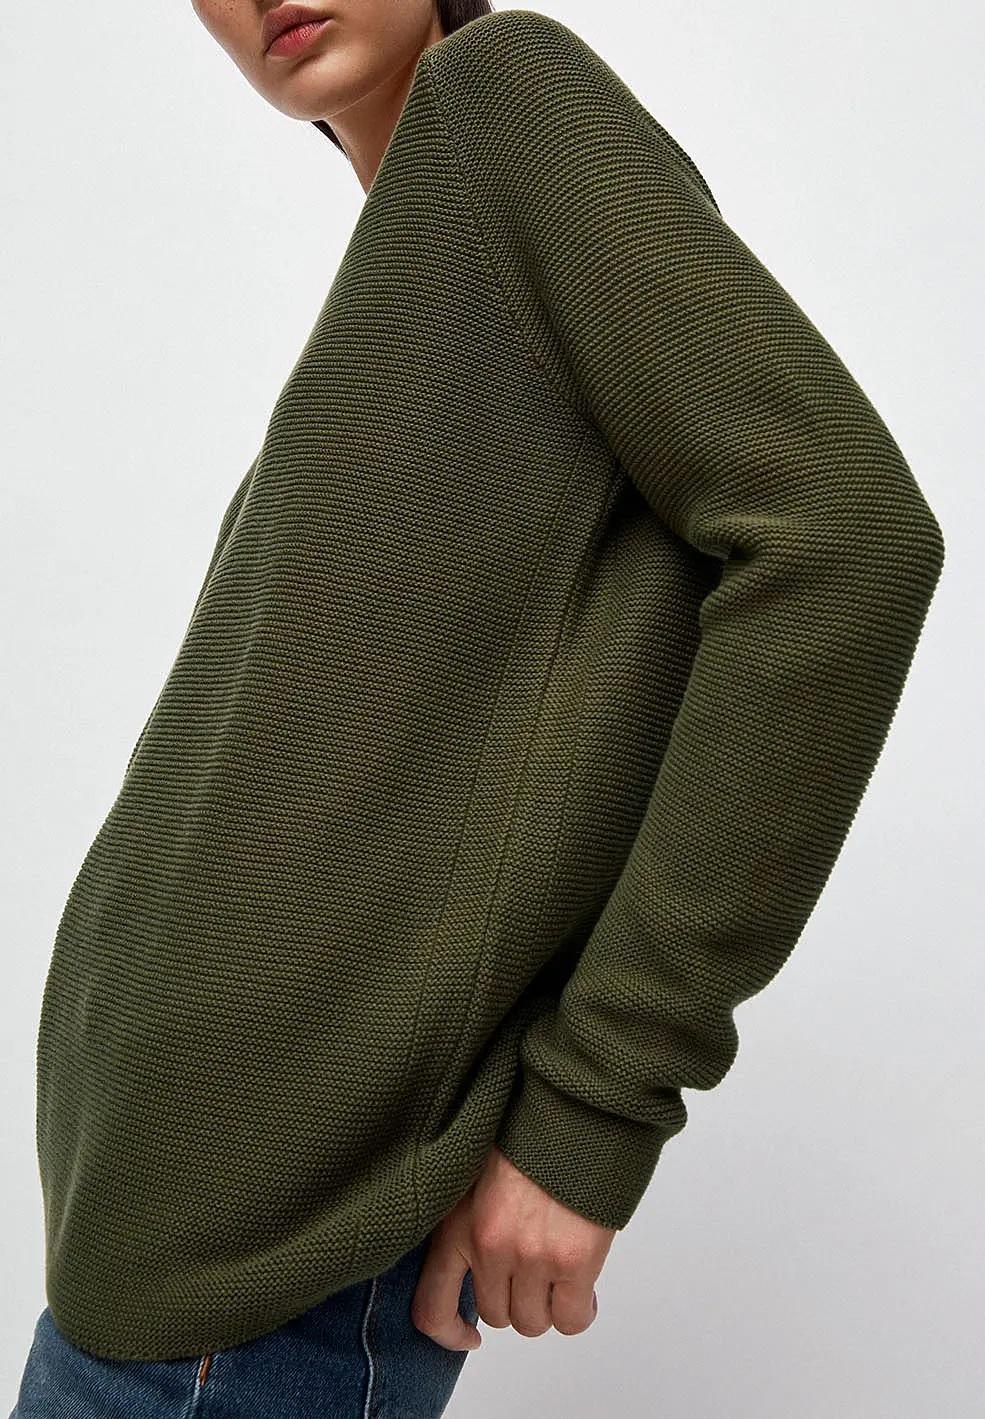 faarina-knit-mossgreen-2